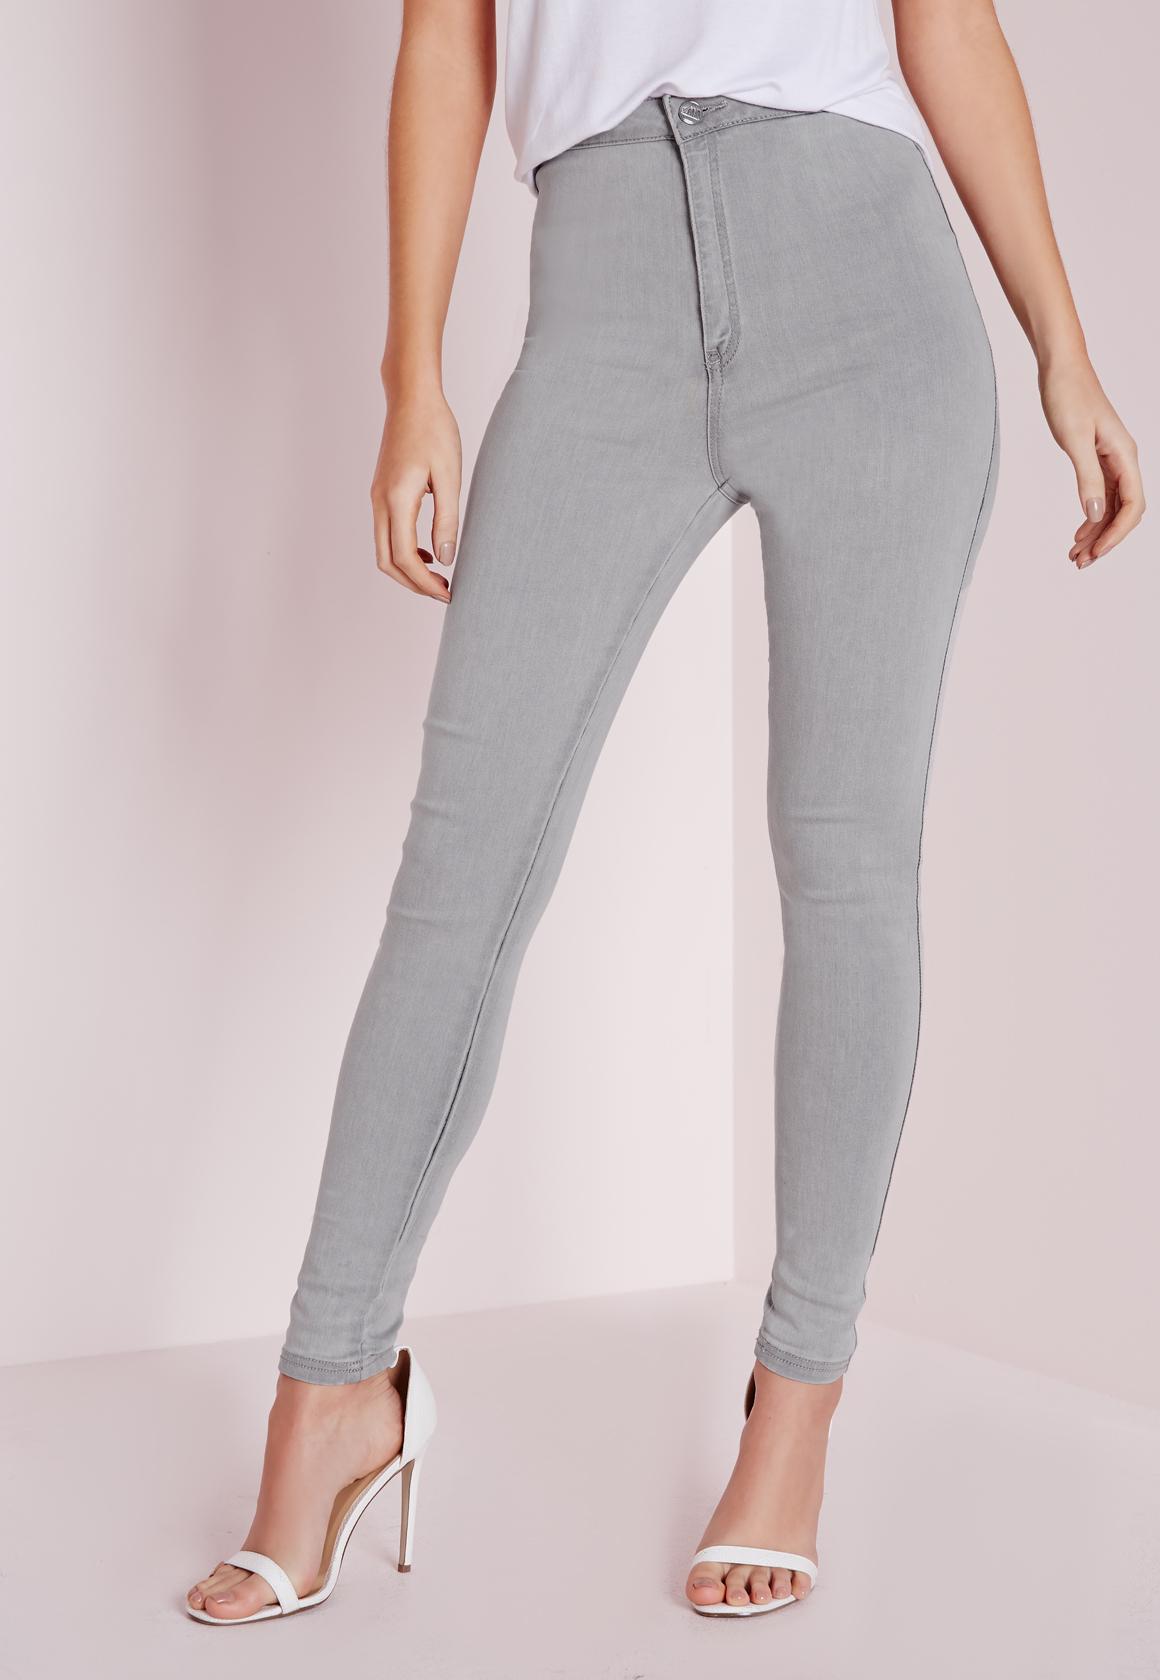 Light grey skinny jeans womens